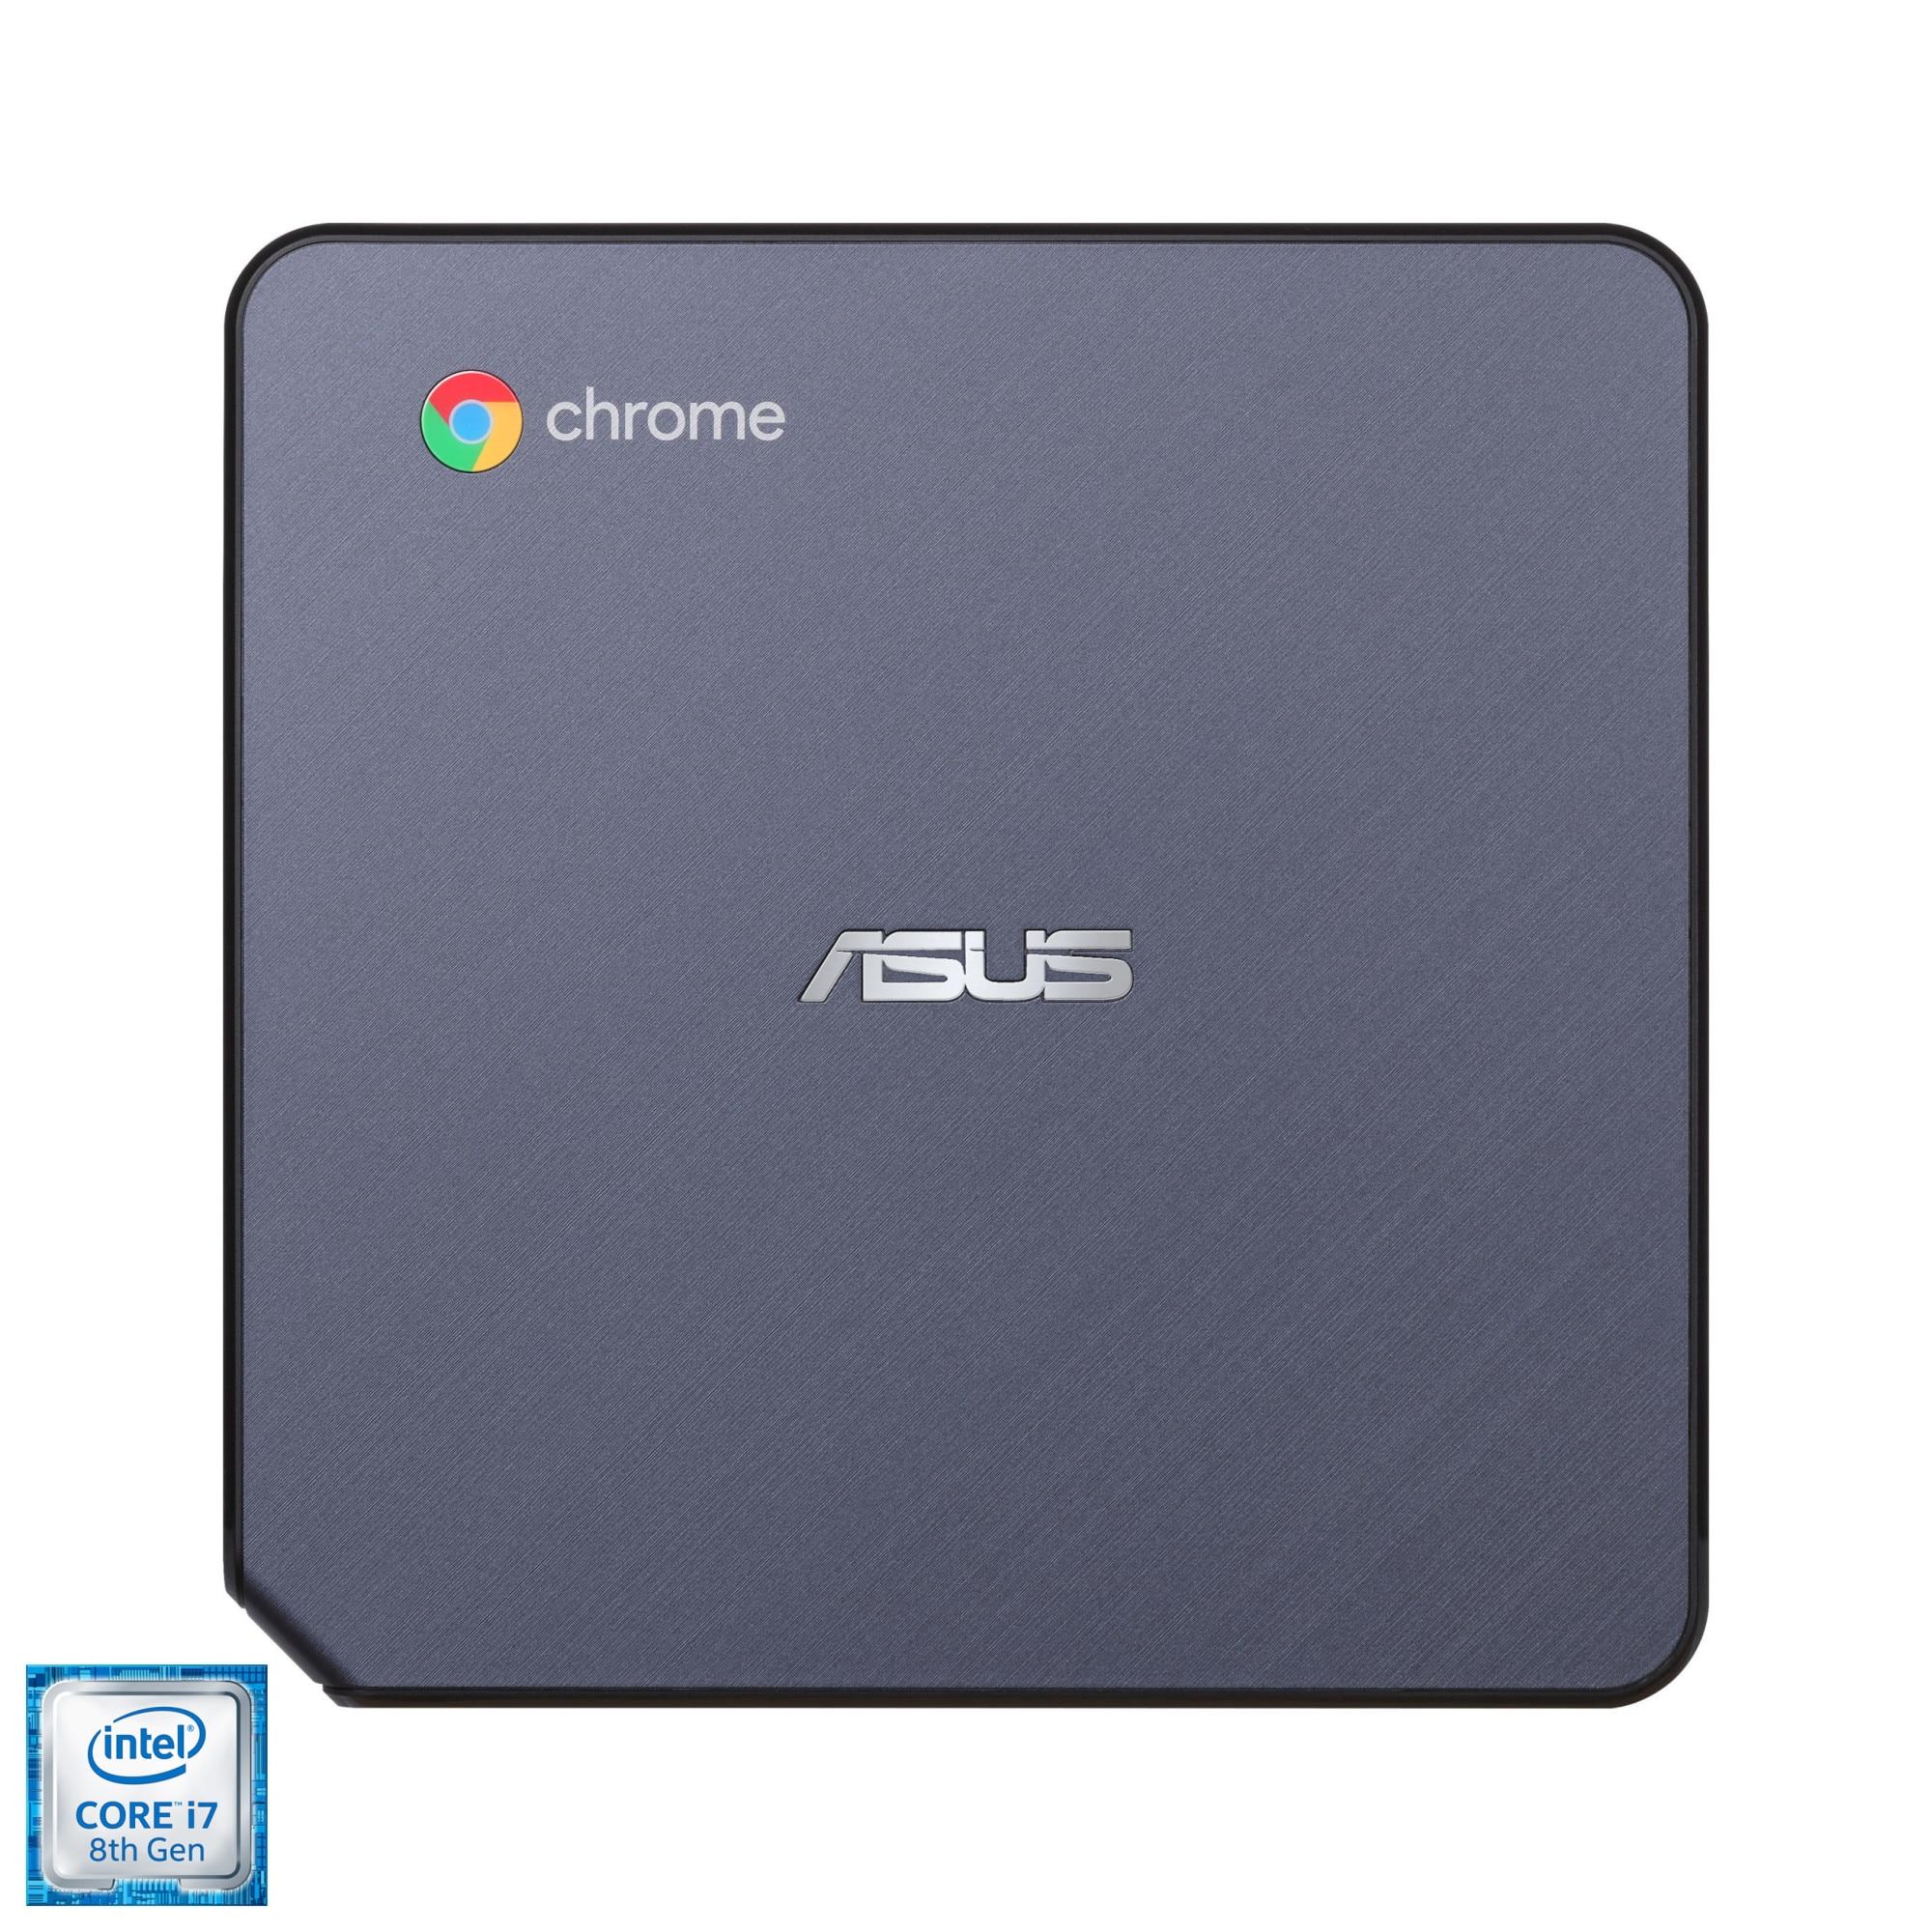 Fotografie Mini PC ASUS Chromebox cu procesor Intel® Core™ i7-8550U pana la 4.0GHz, 16GB DDR4, 128GB SSD, Intel® UHD Graphics 620, Chrome OS